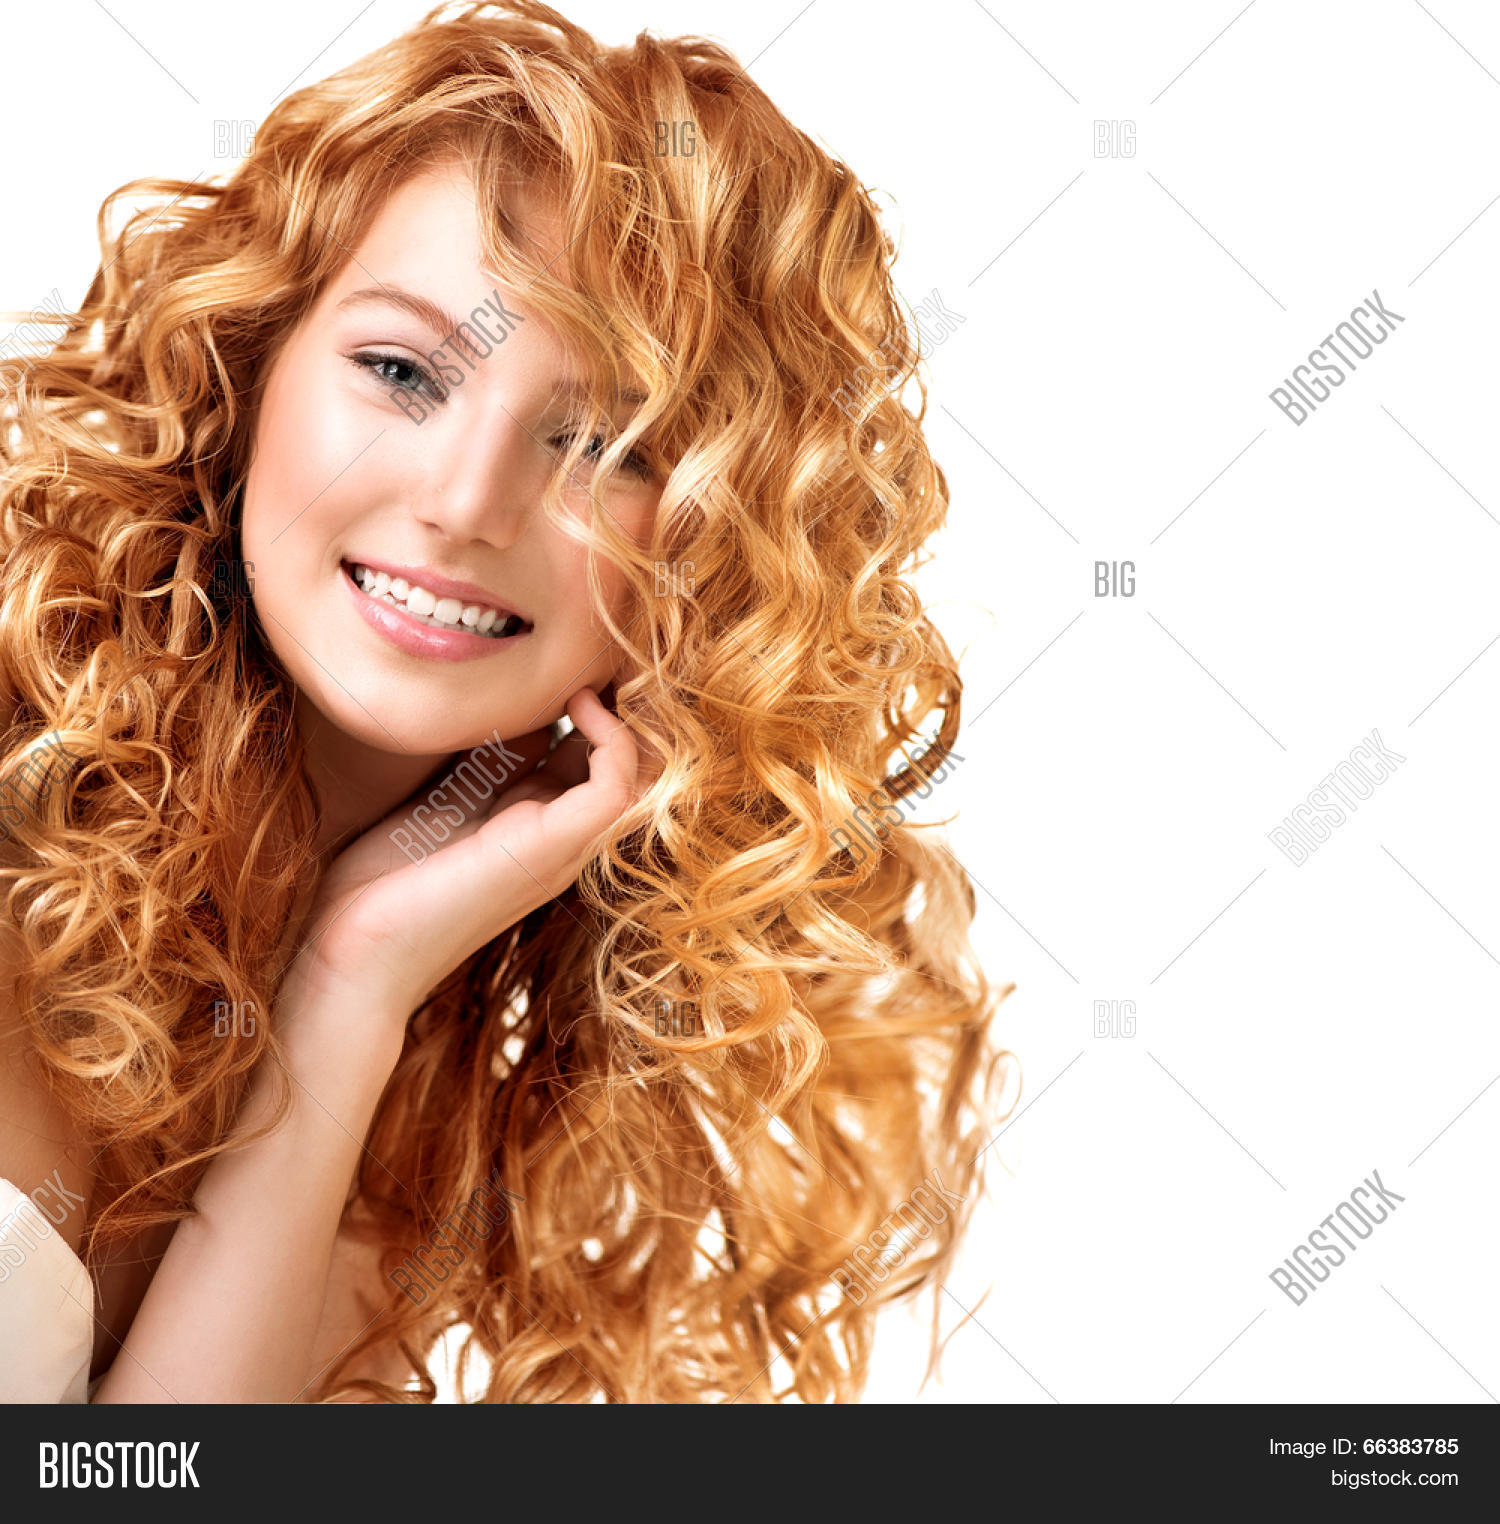 Beauty Teenage Model Girl Portrait Image Amp Photo Bigstock